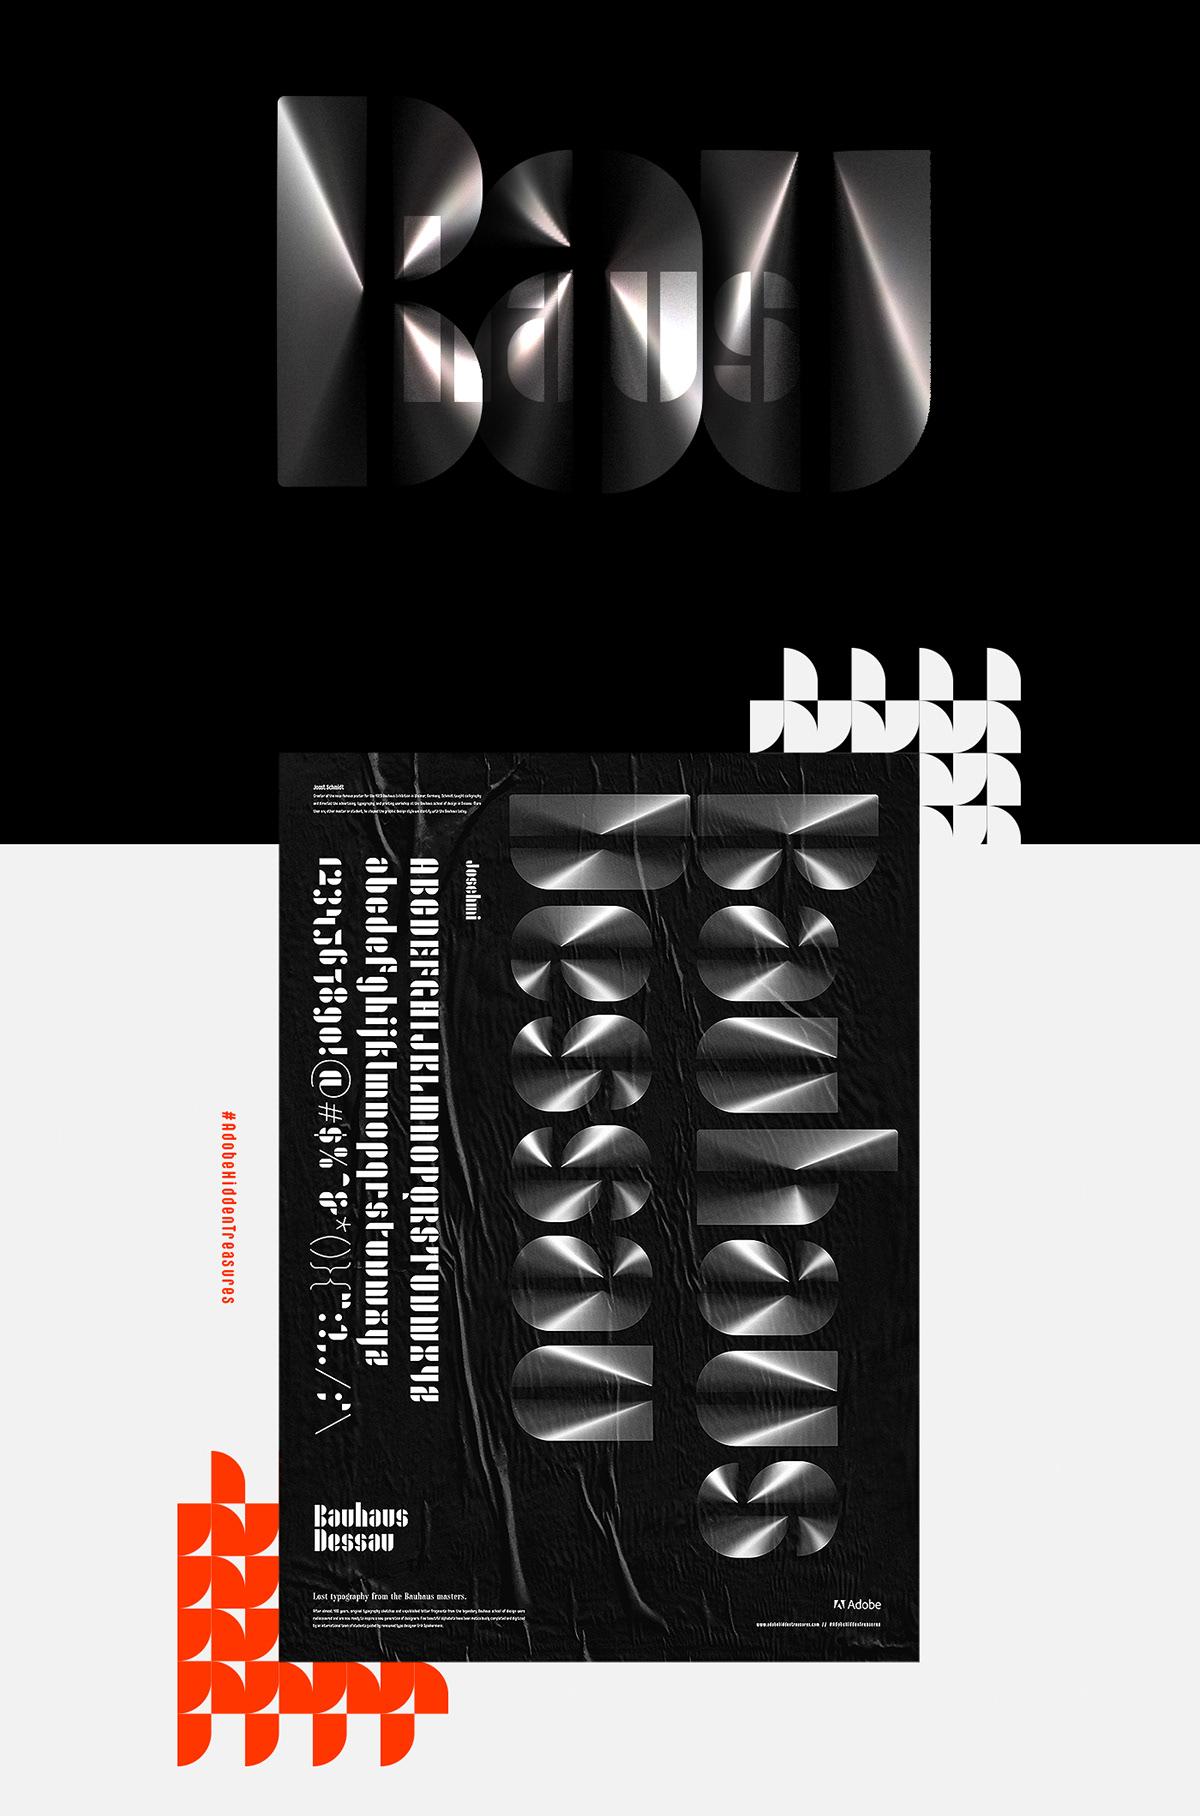 poster,AdobeHiddenTreasures,Bauhaus Dessau,adobe,fonts,Joschmi,minimal,Black&white